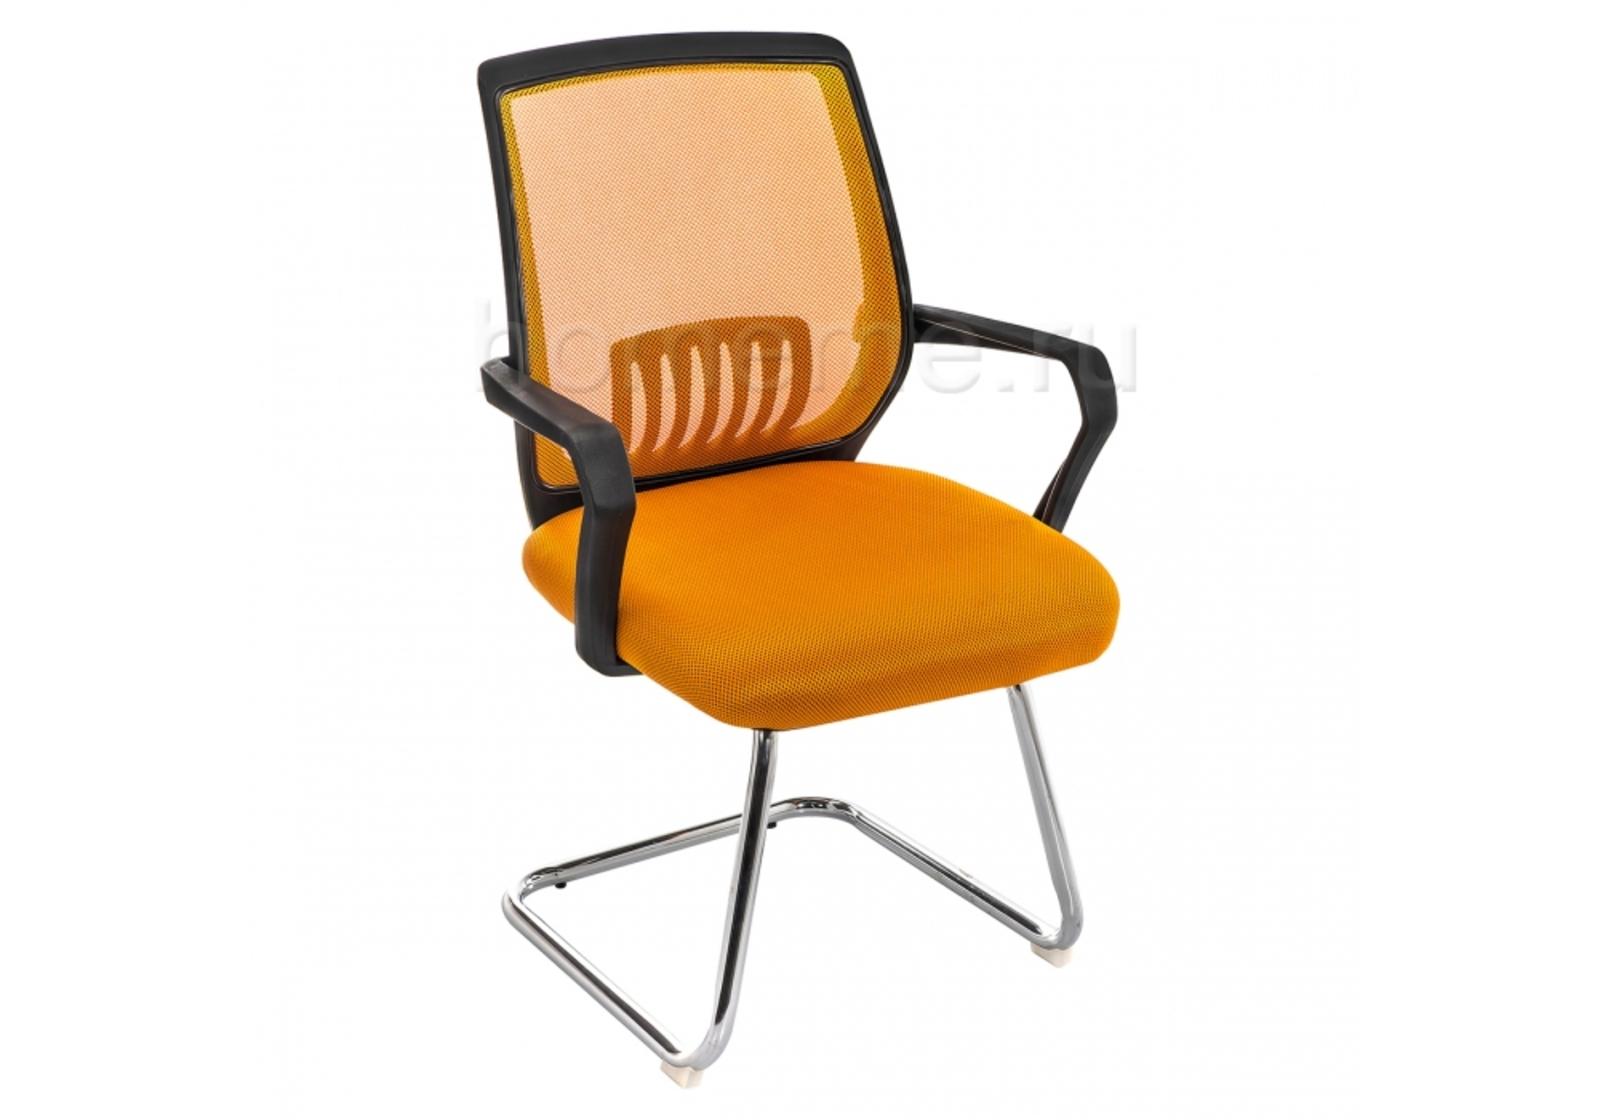 Стул Point оранжевый / черный 11520 Point оранжевый / черный 11520 (17475) фото